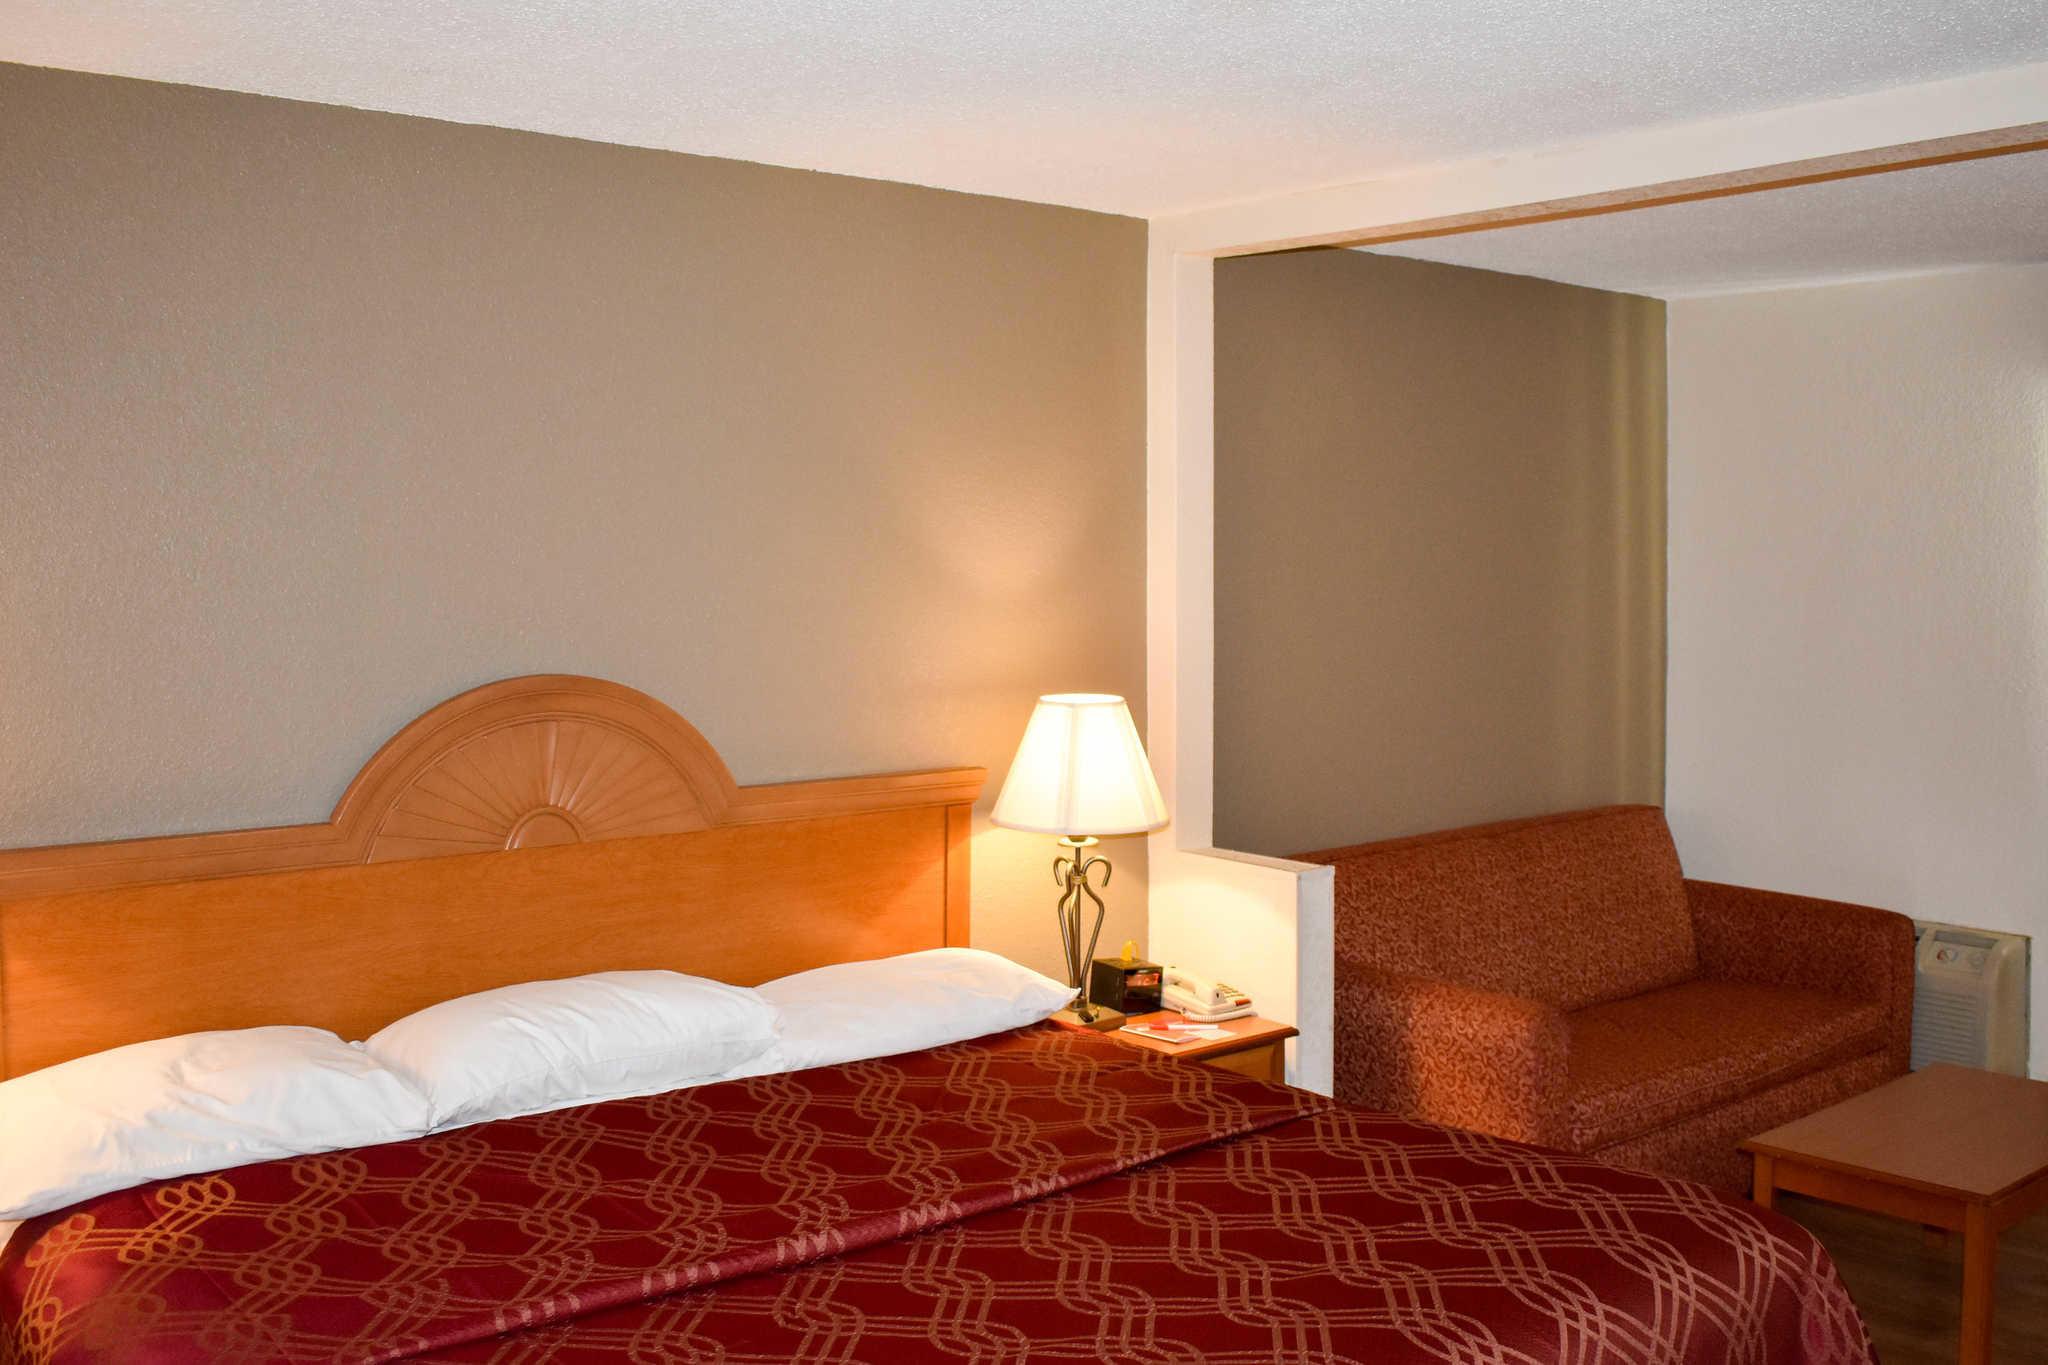 Econo Lodge Inn & Suites - Closed image 19